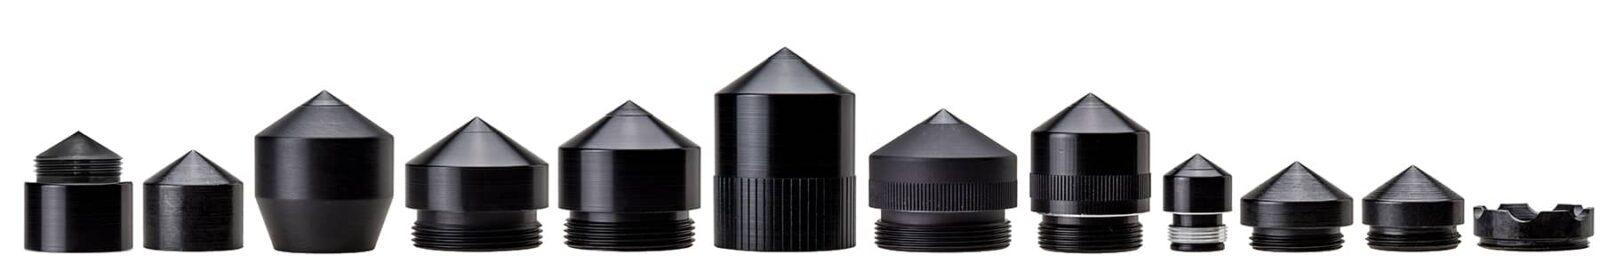 Bust A Cap, Inc.® - Glass Breaking Caps